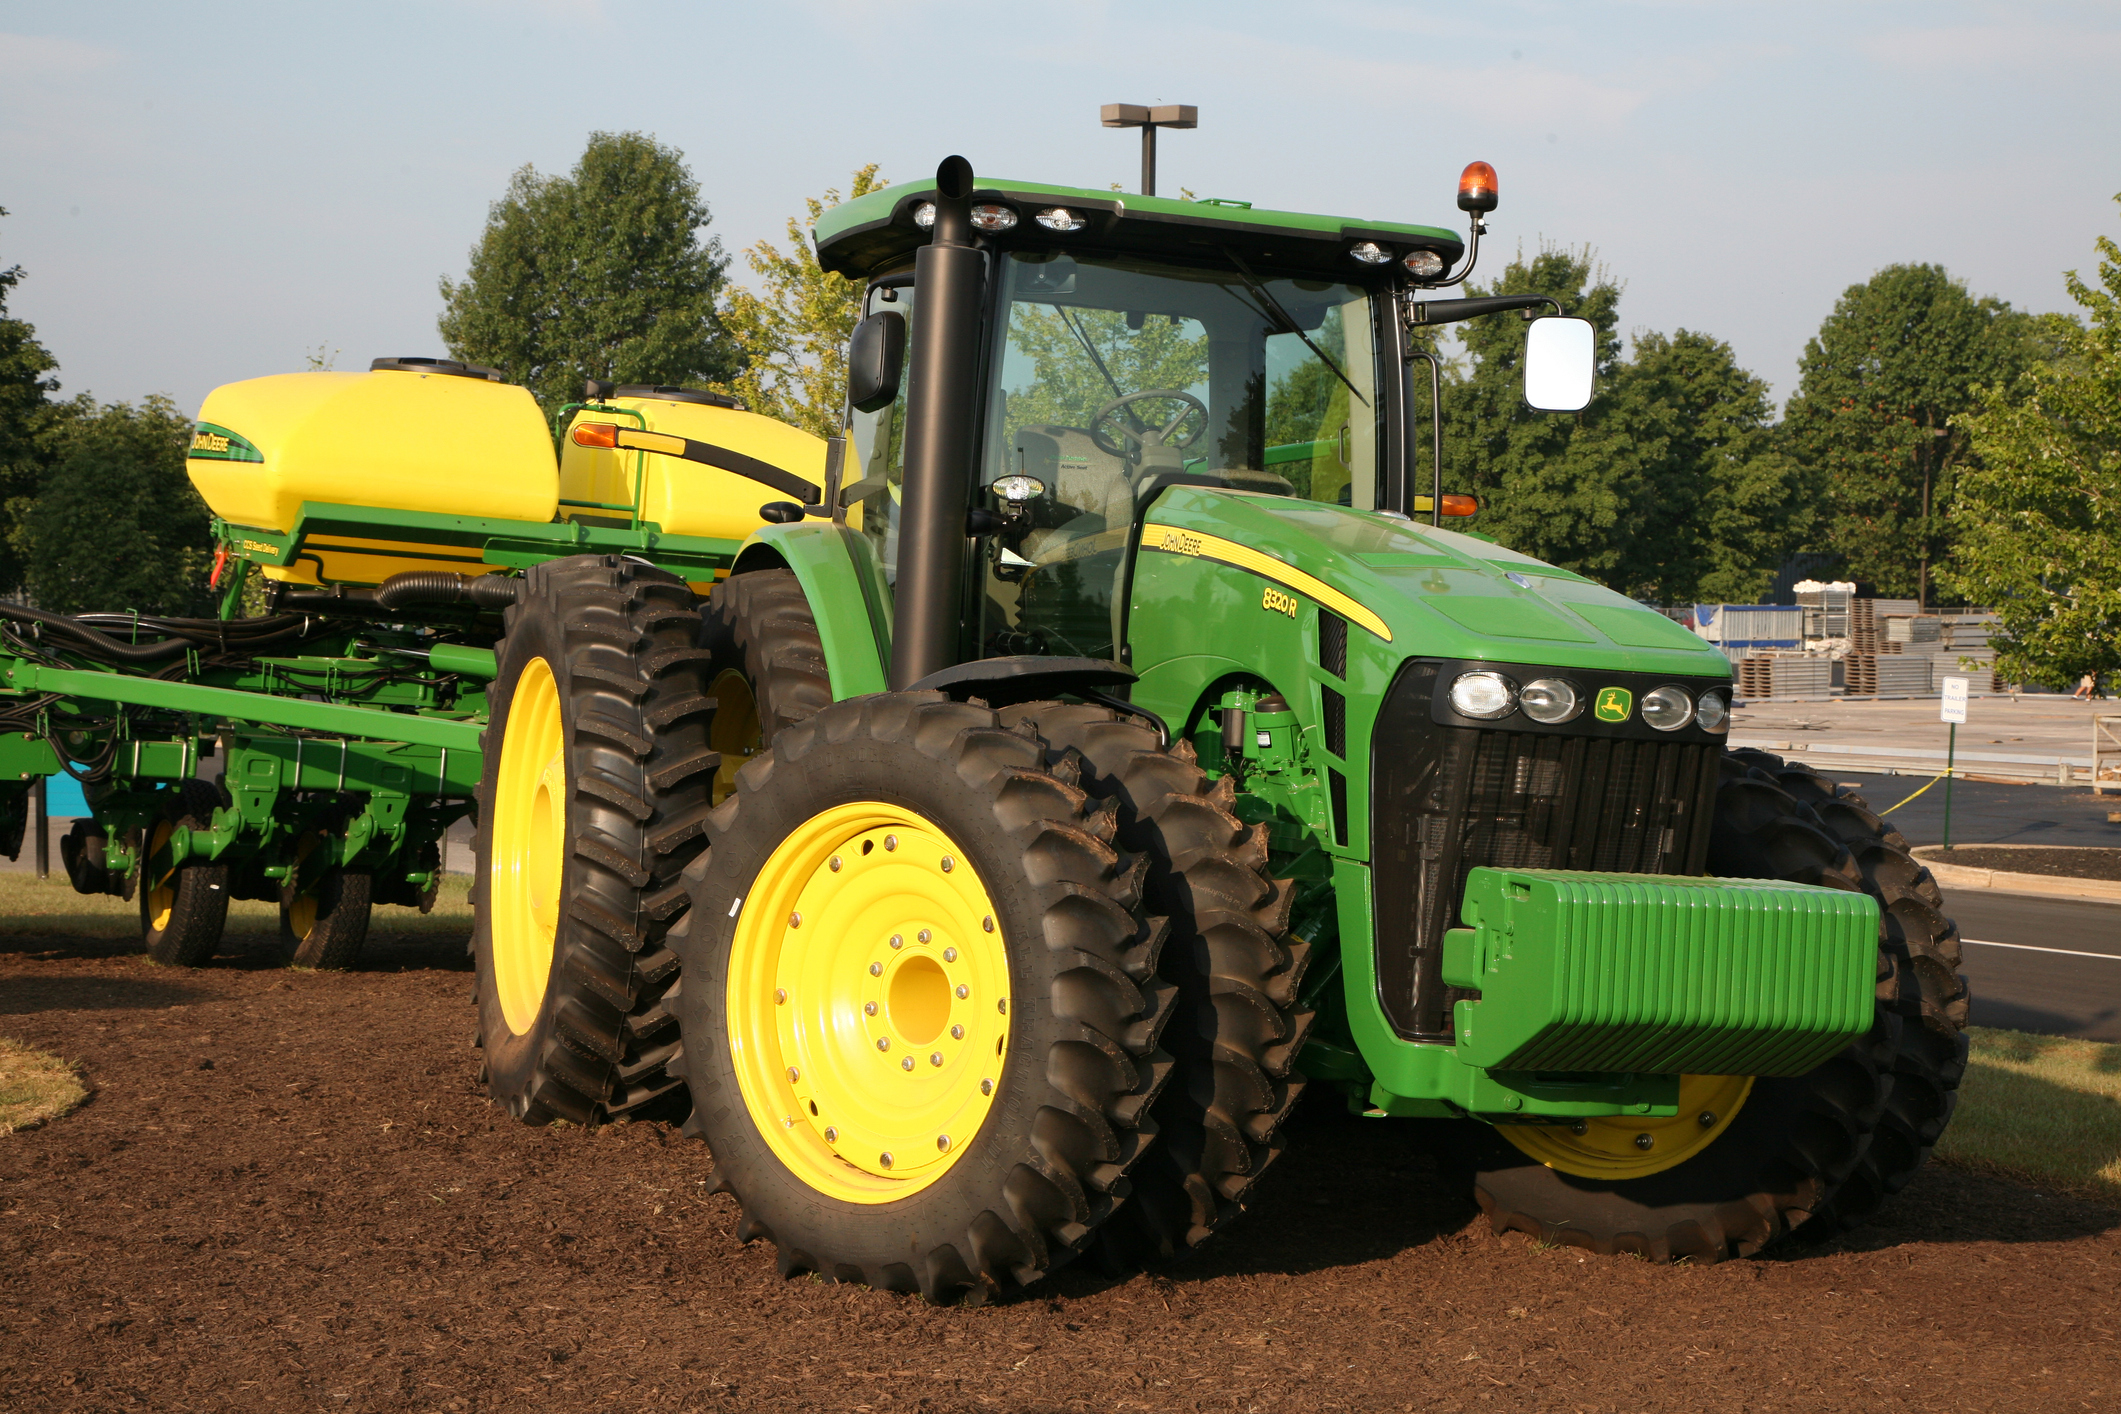 Southern USA National Farm Machinery Show 2020